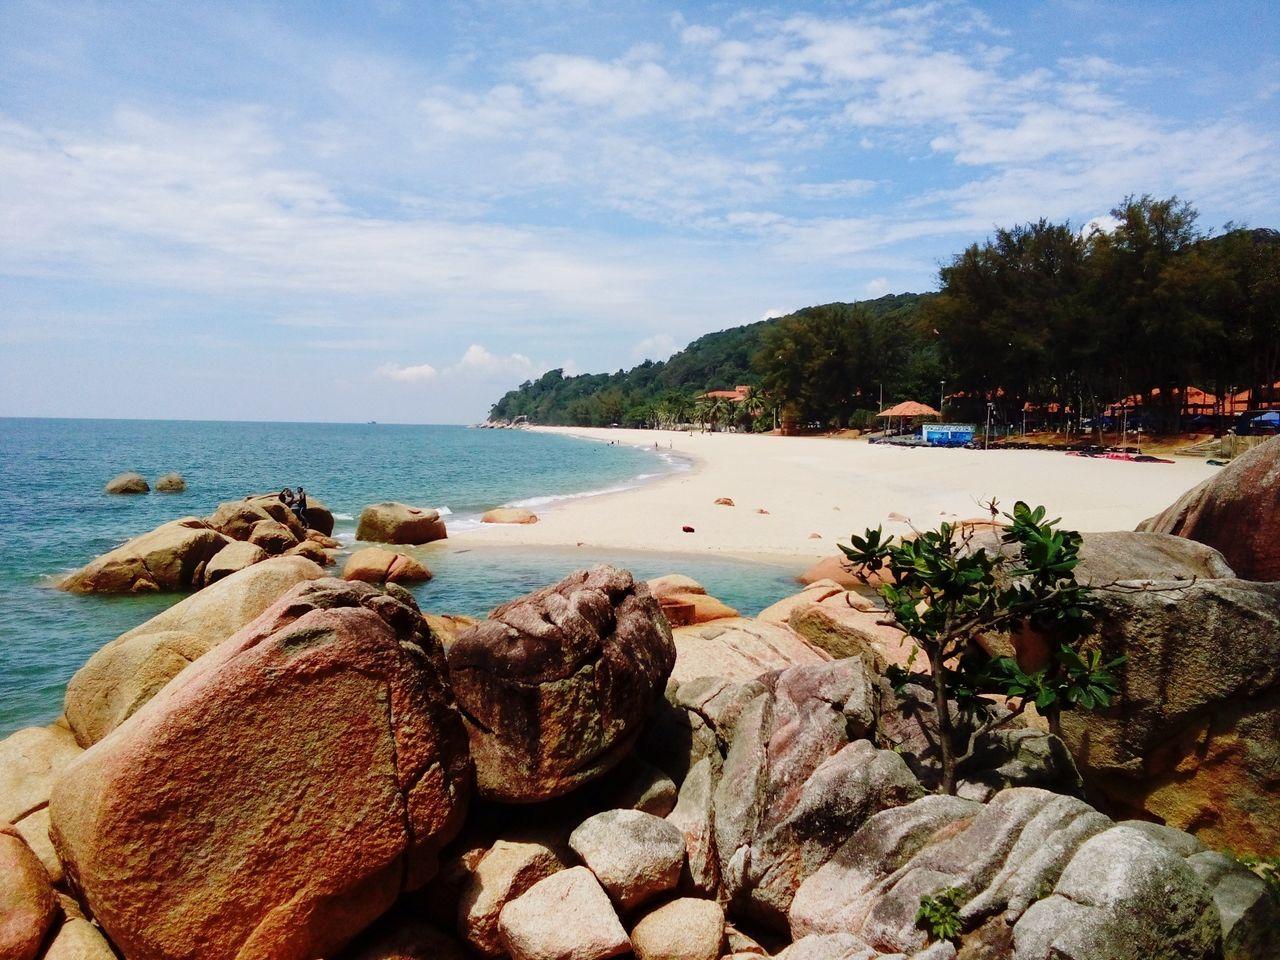 Teluk Cempedak Pahang, Malaysia